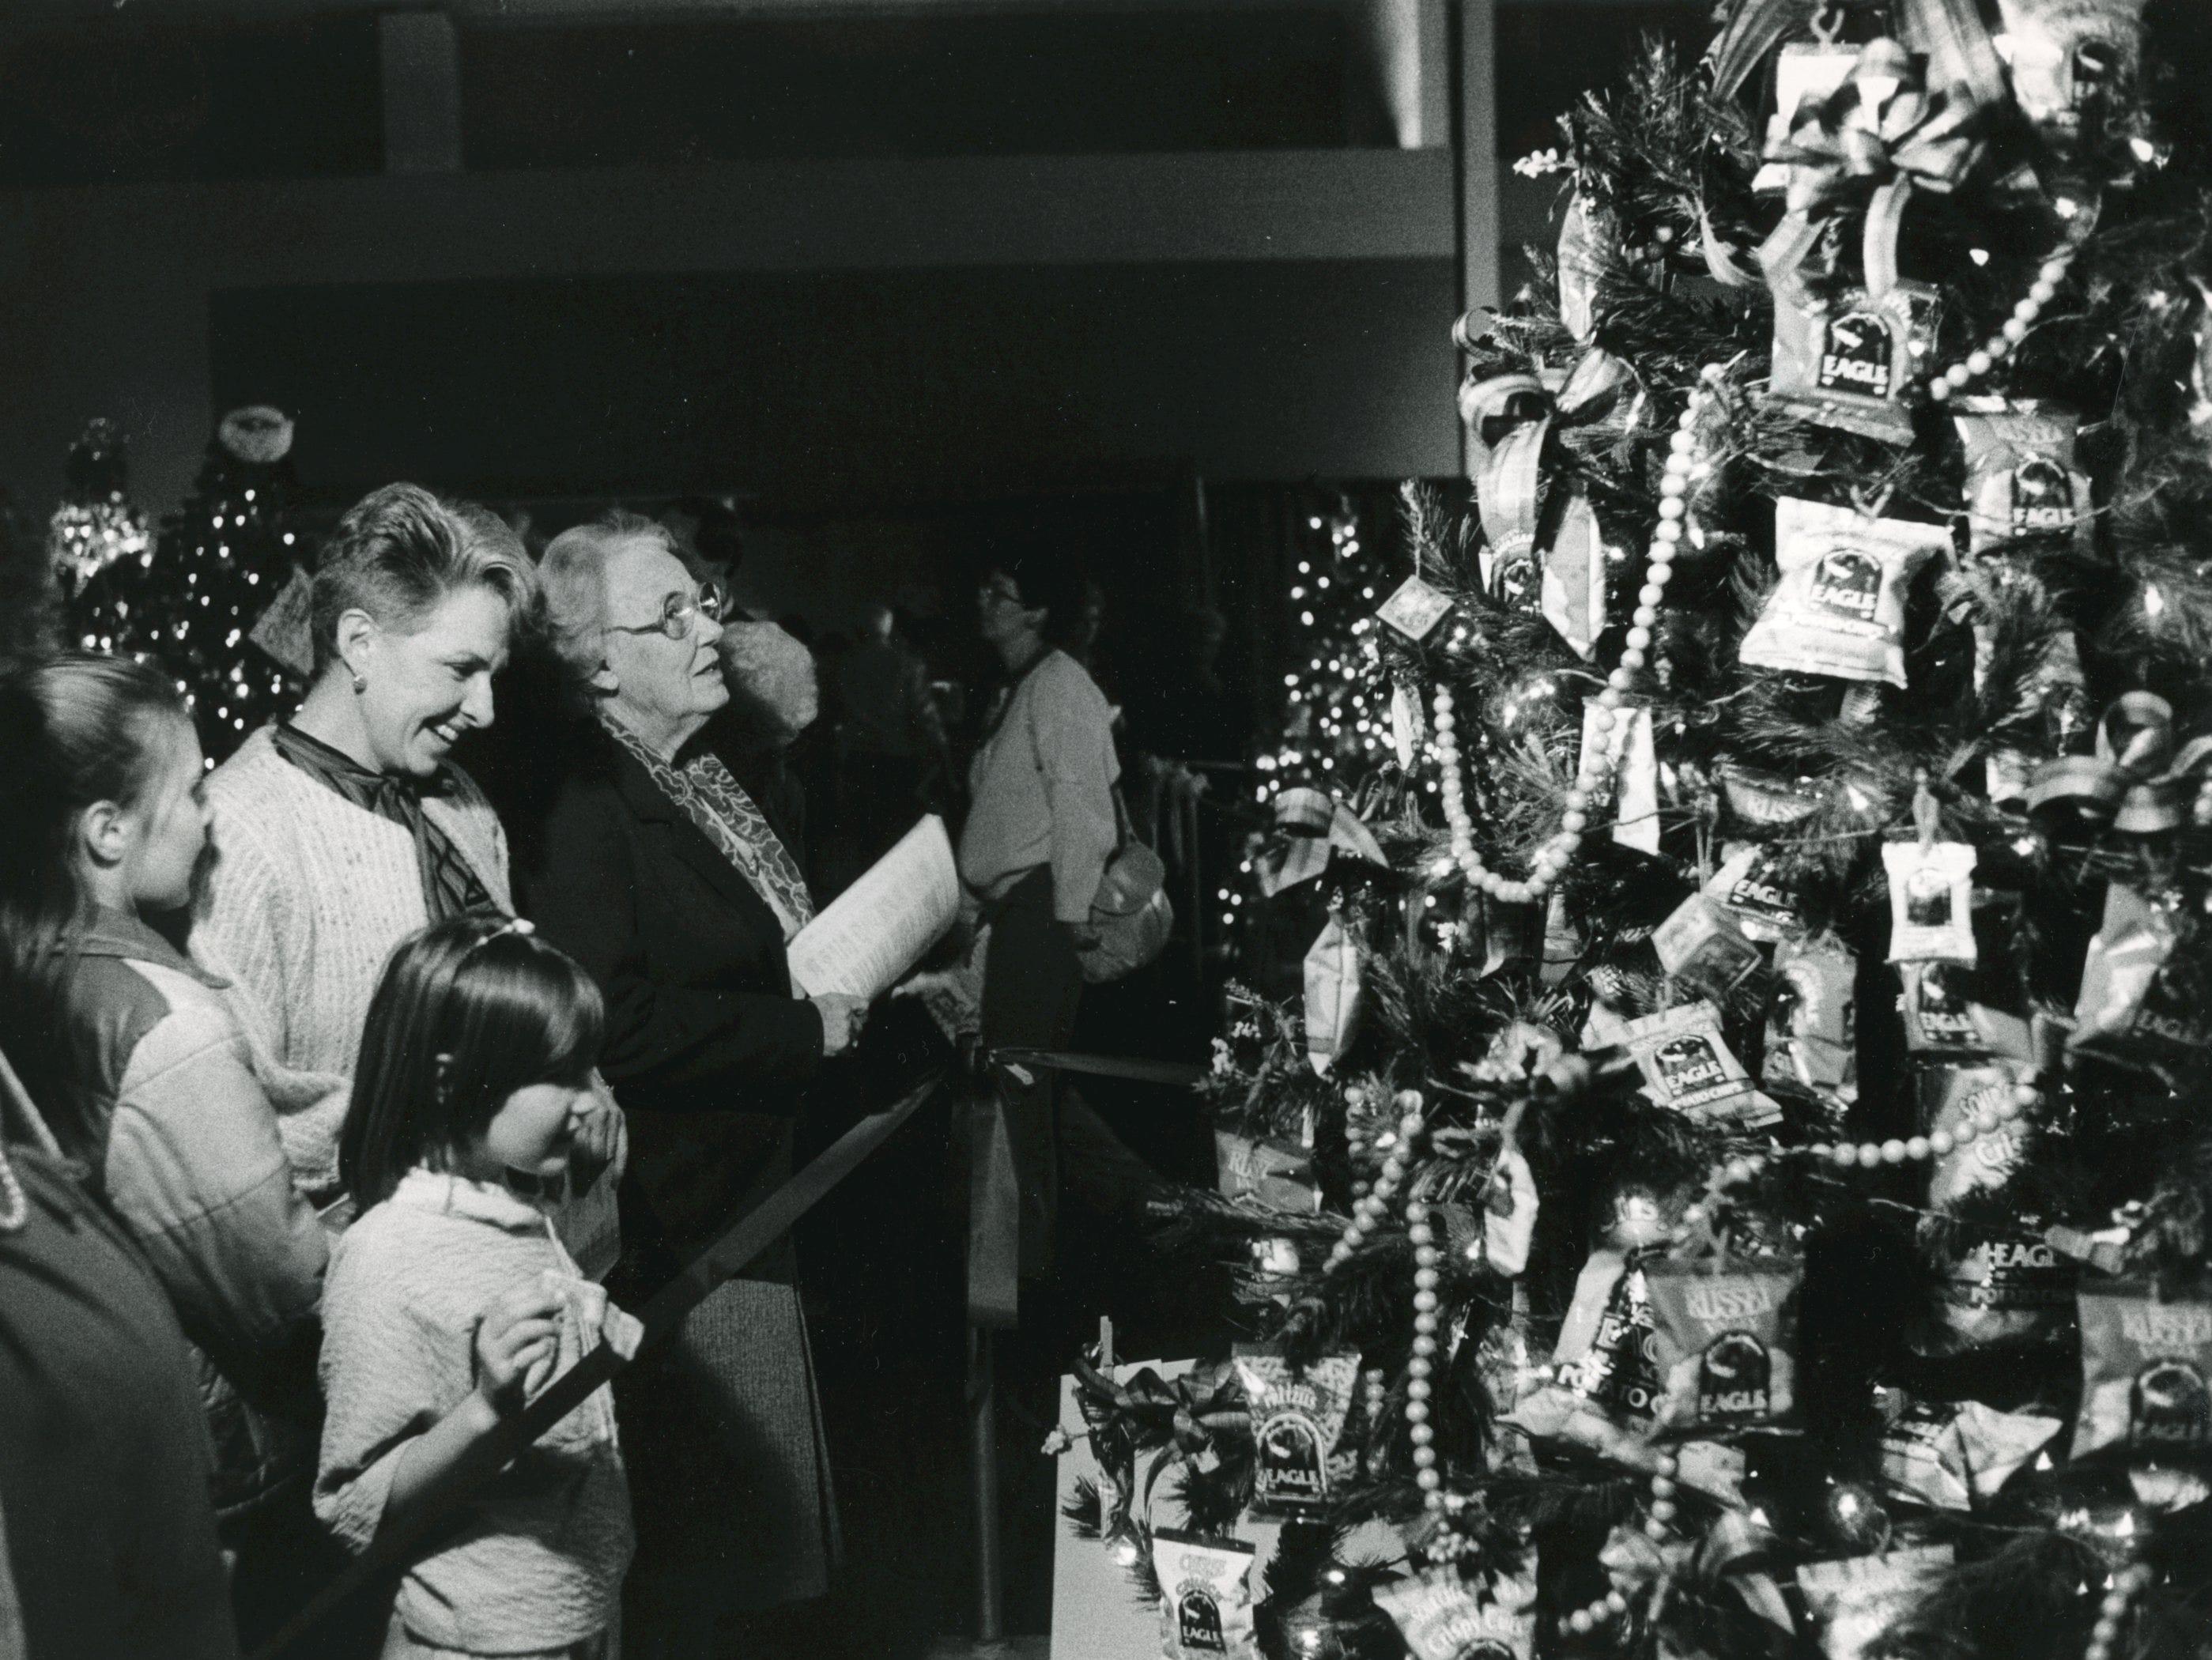 Spectators enjoy one of the many Christmas trees on display at Fantasy of Trees, November, 1986.